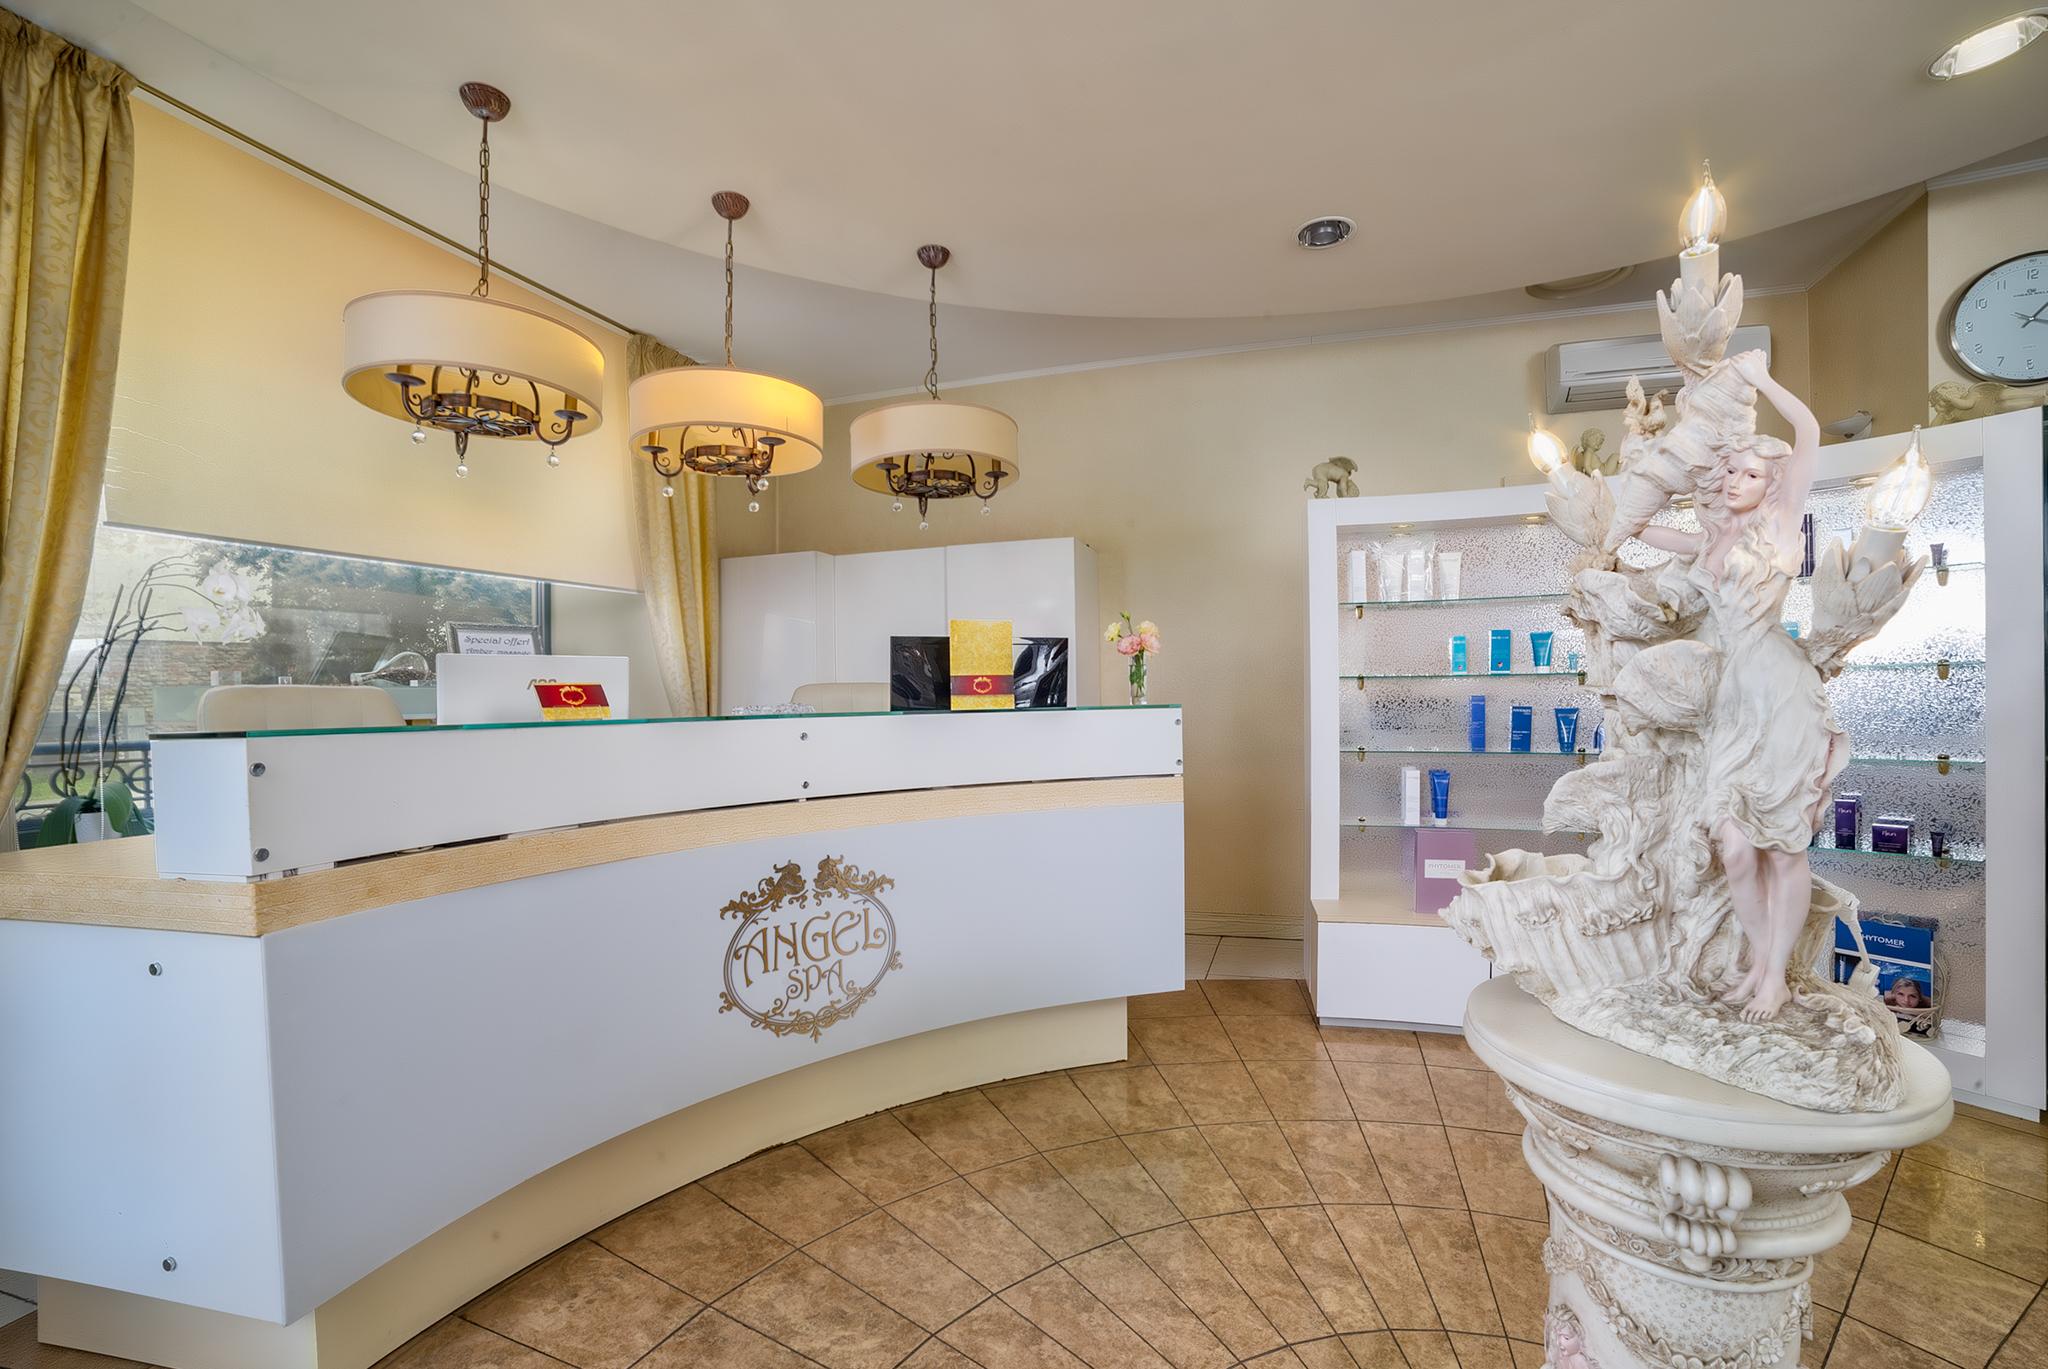 Gallery Exquisite Spa Salon Interior Design In Vilnius Angel Spa